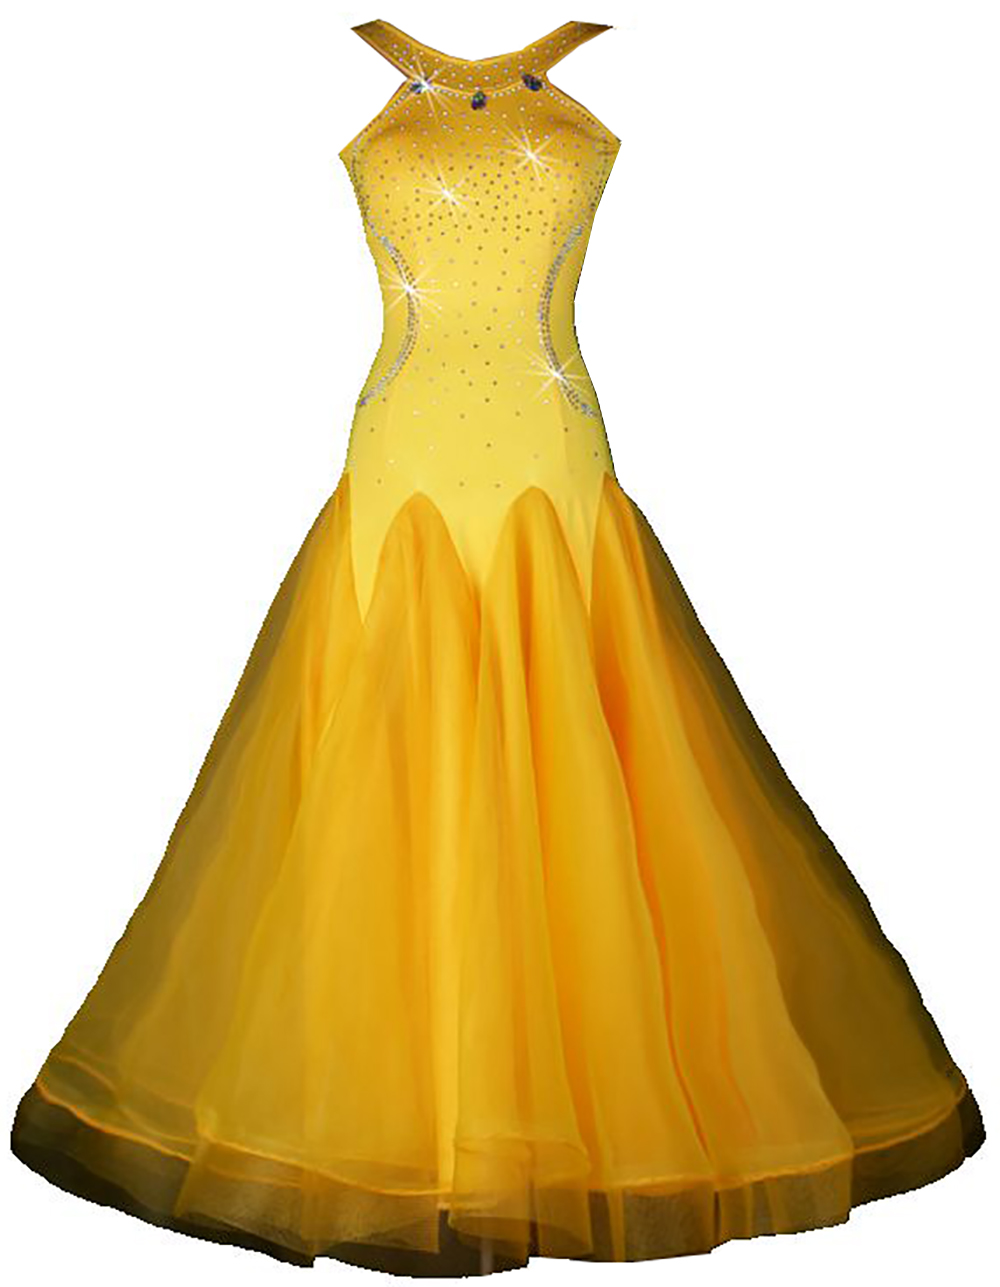 ballroom waltz dresses yellow competition ballroom dresses waltz ...